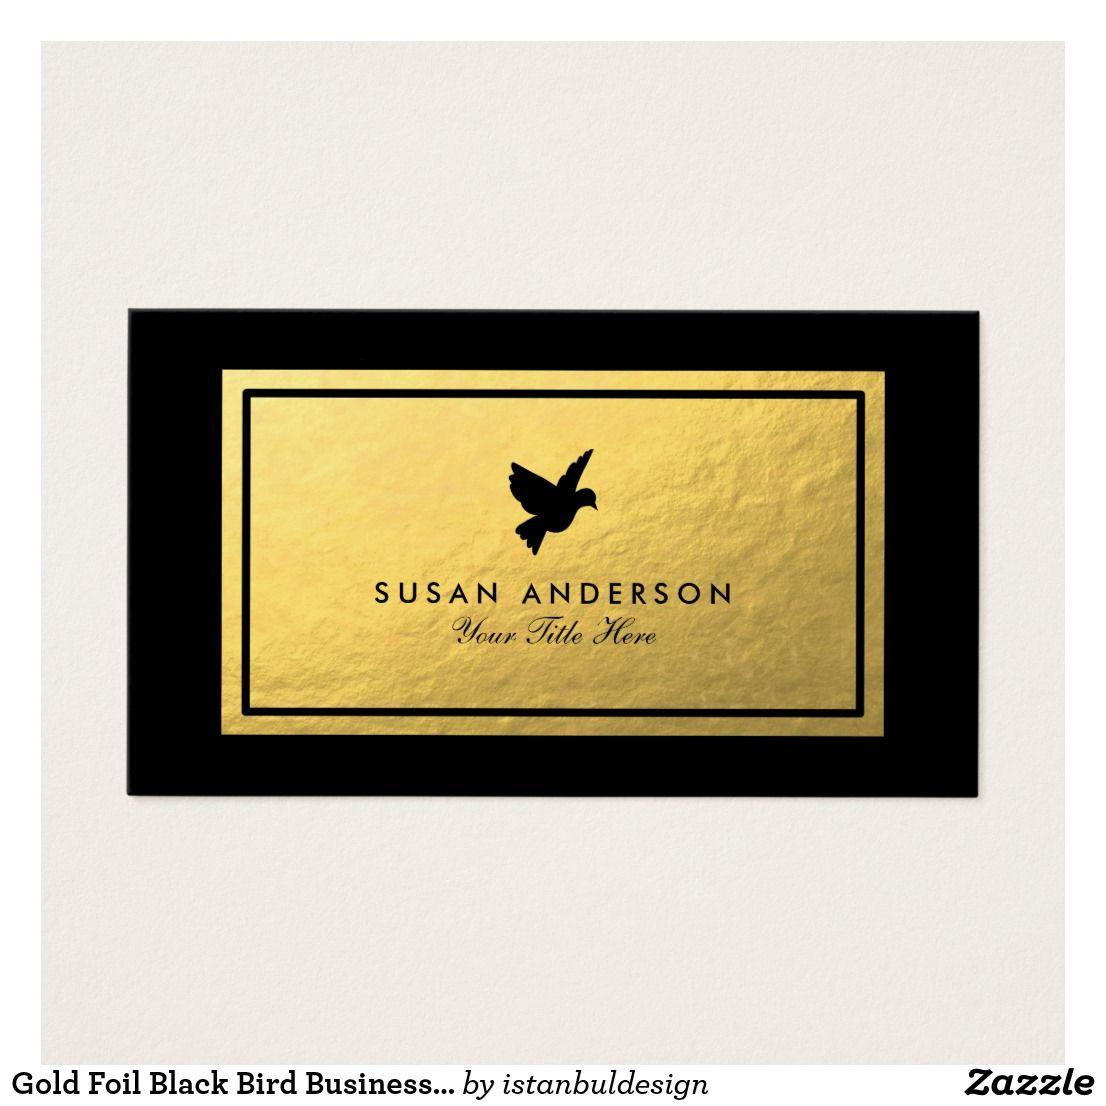 Gold Foil Black Bird Business Card   Business cards